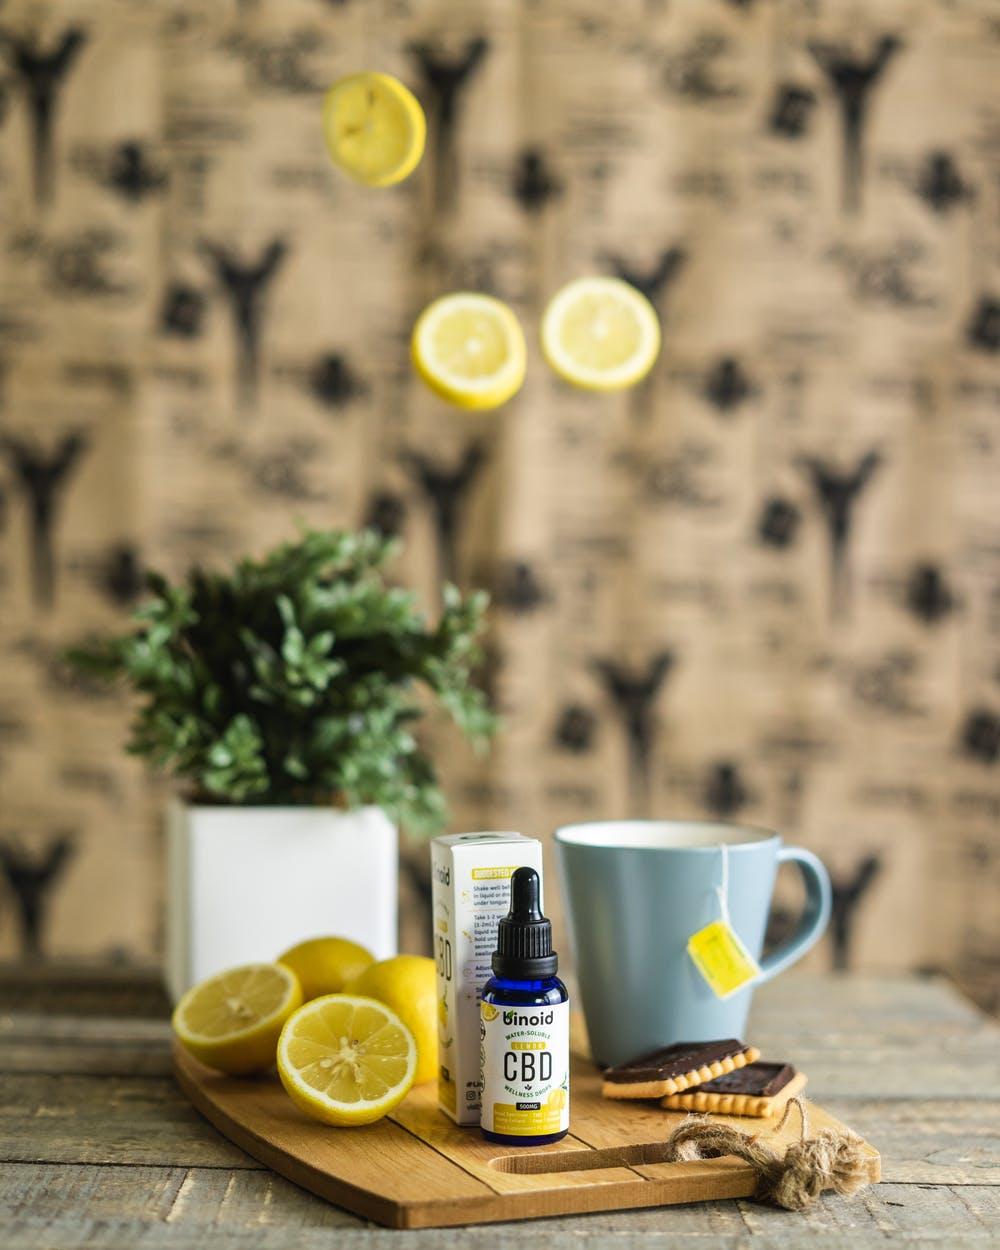 Tea tree oil benefits